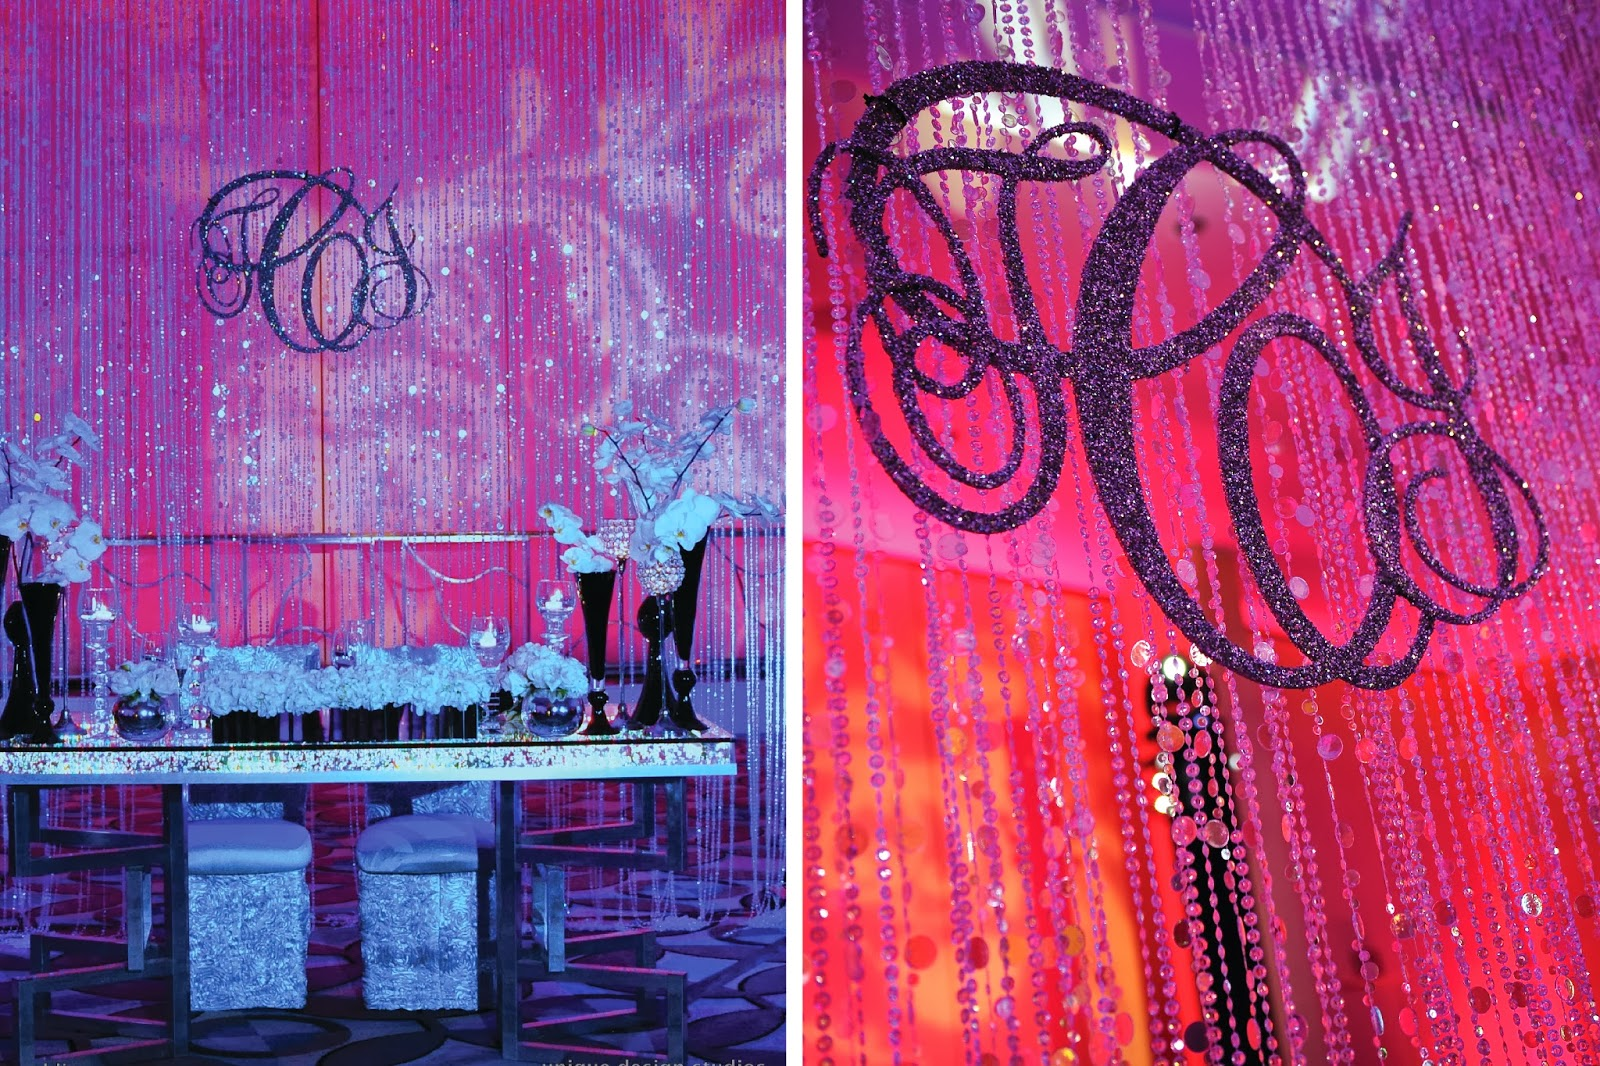 Bling Wedding Decor Backdrop With Custom Monogram By Tiffany Cook